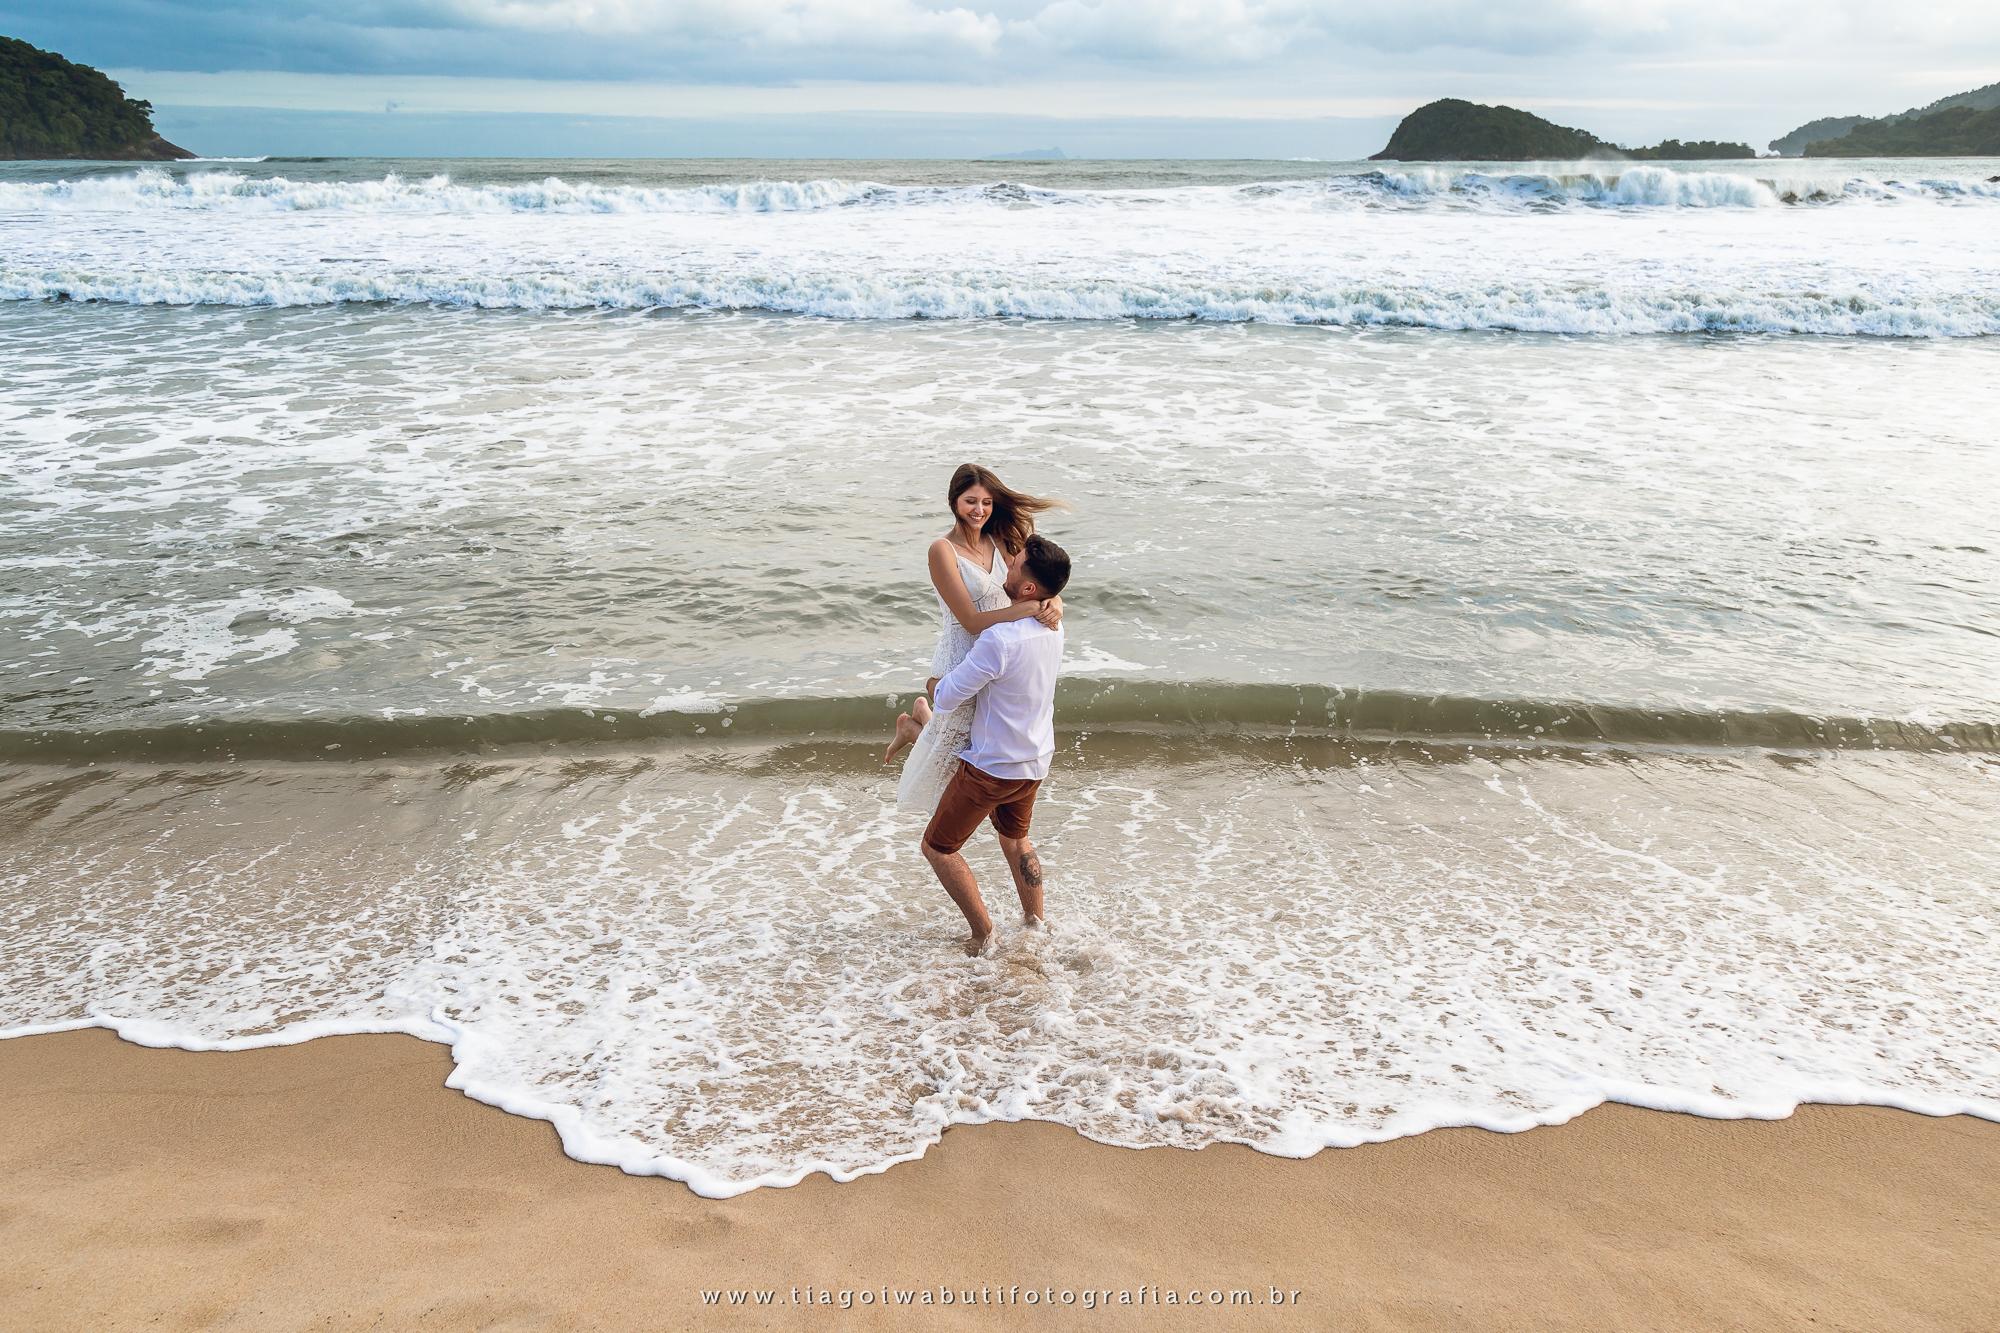 Contate Fotógrafo de Casamento e Família - Suzano - SP | Tiago Iwabuti